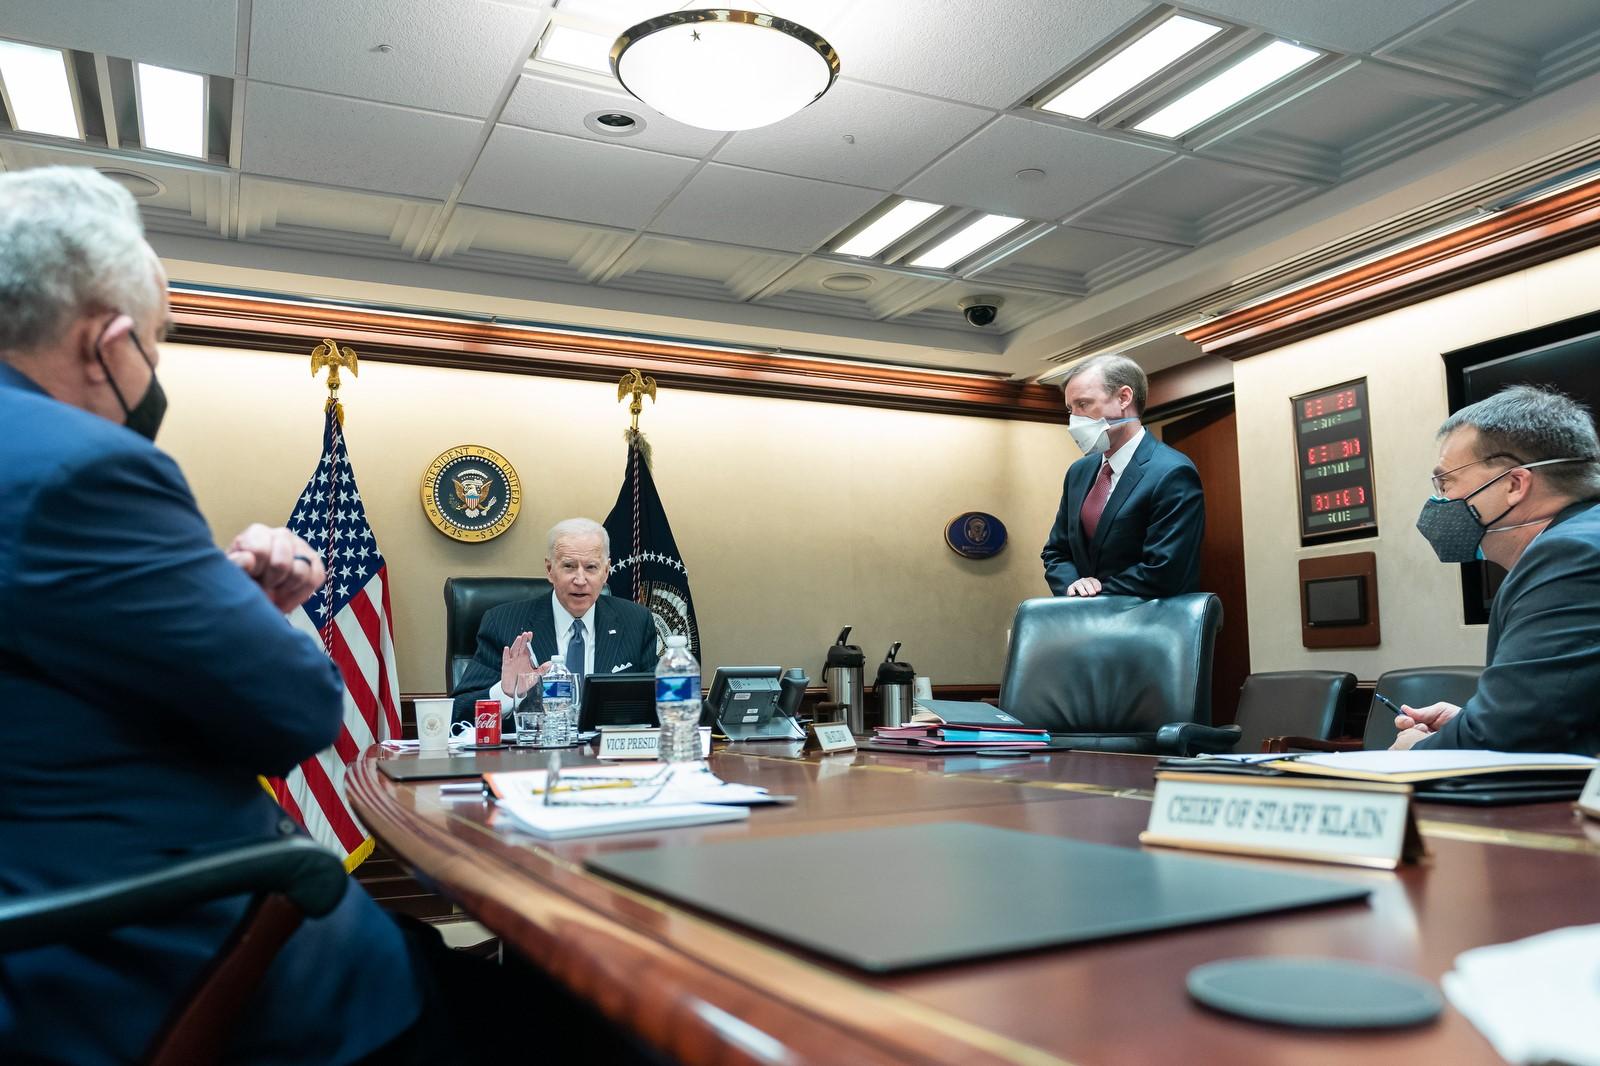 President Joe Biden talks by phone with Australian Prime Minister Scott Morrison from the White House Situation Room on 3 February 2021 (Adam Schultz/White House/Flickr)